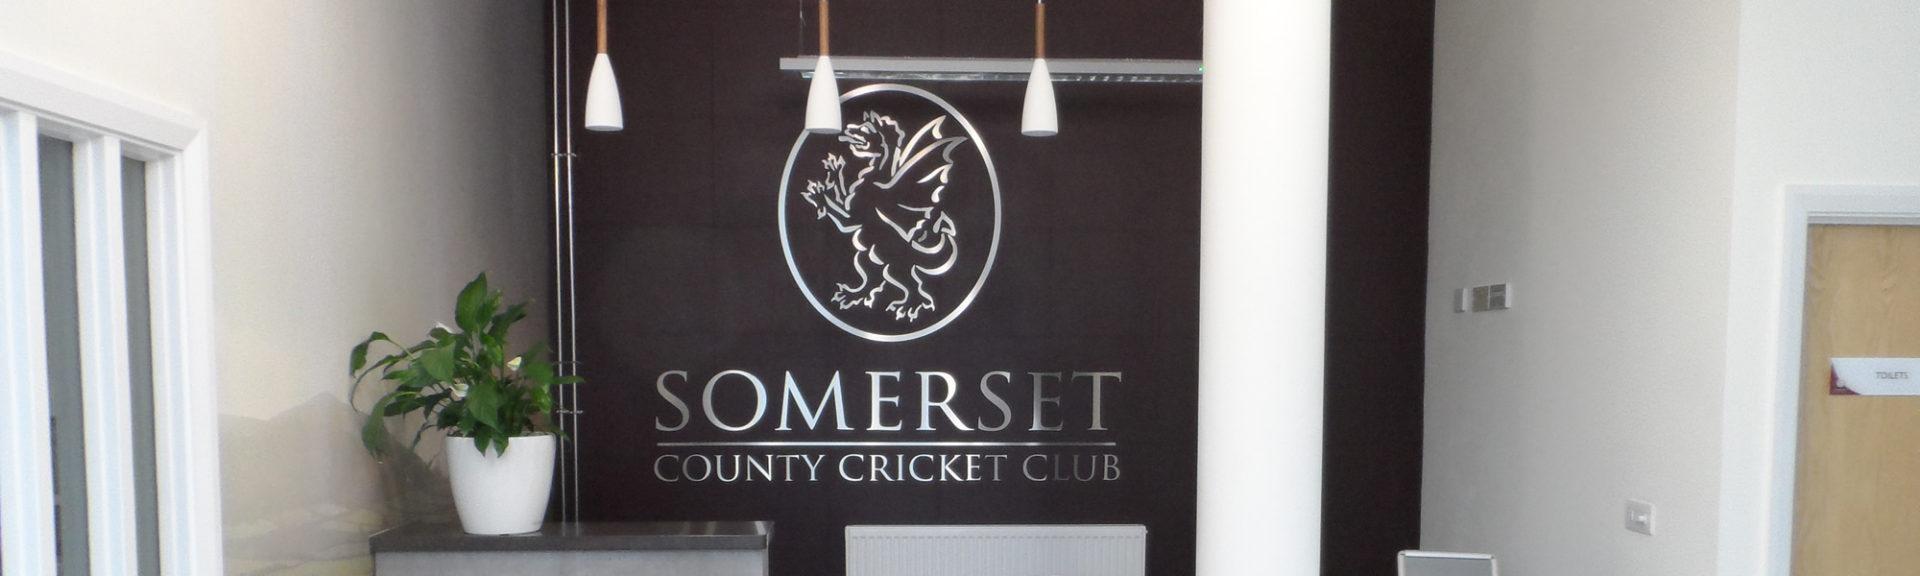 banner-somerset-ccc